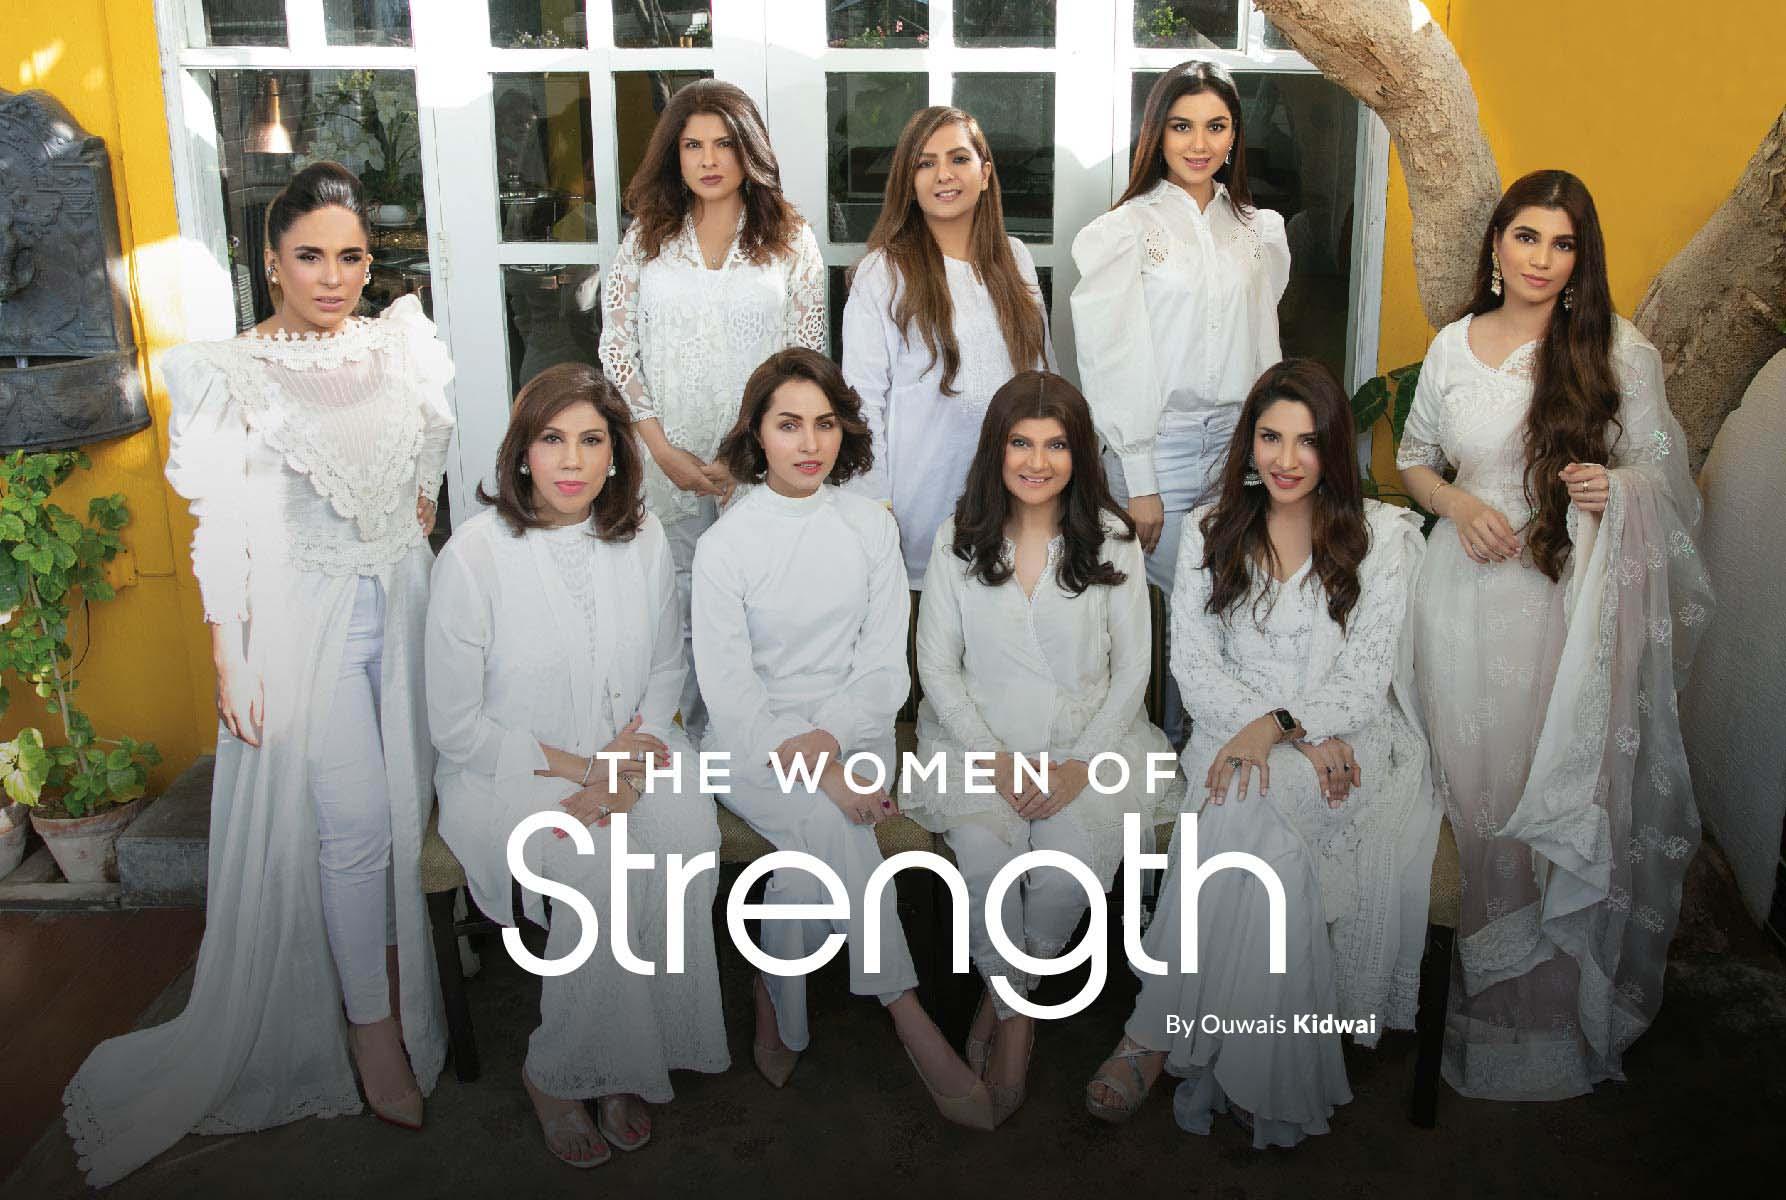 The Women of Strength